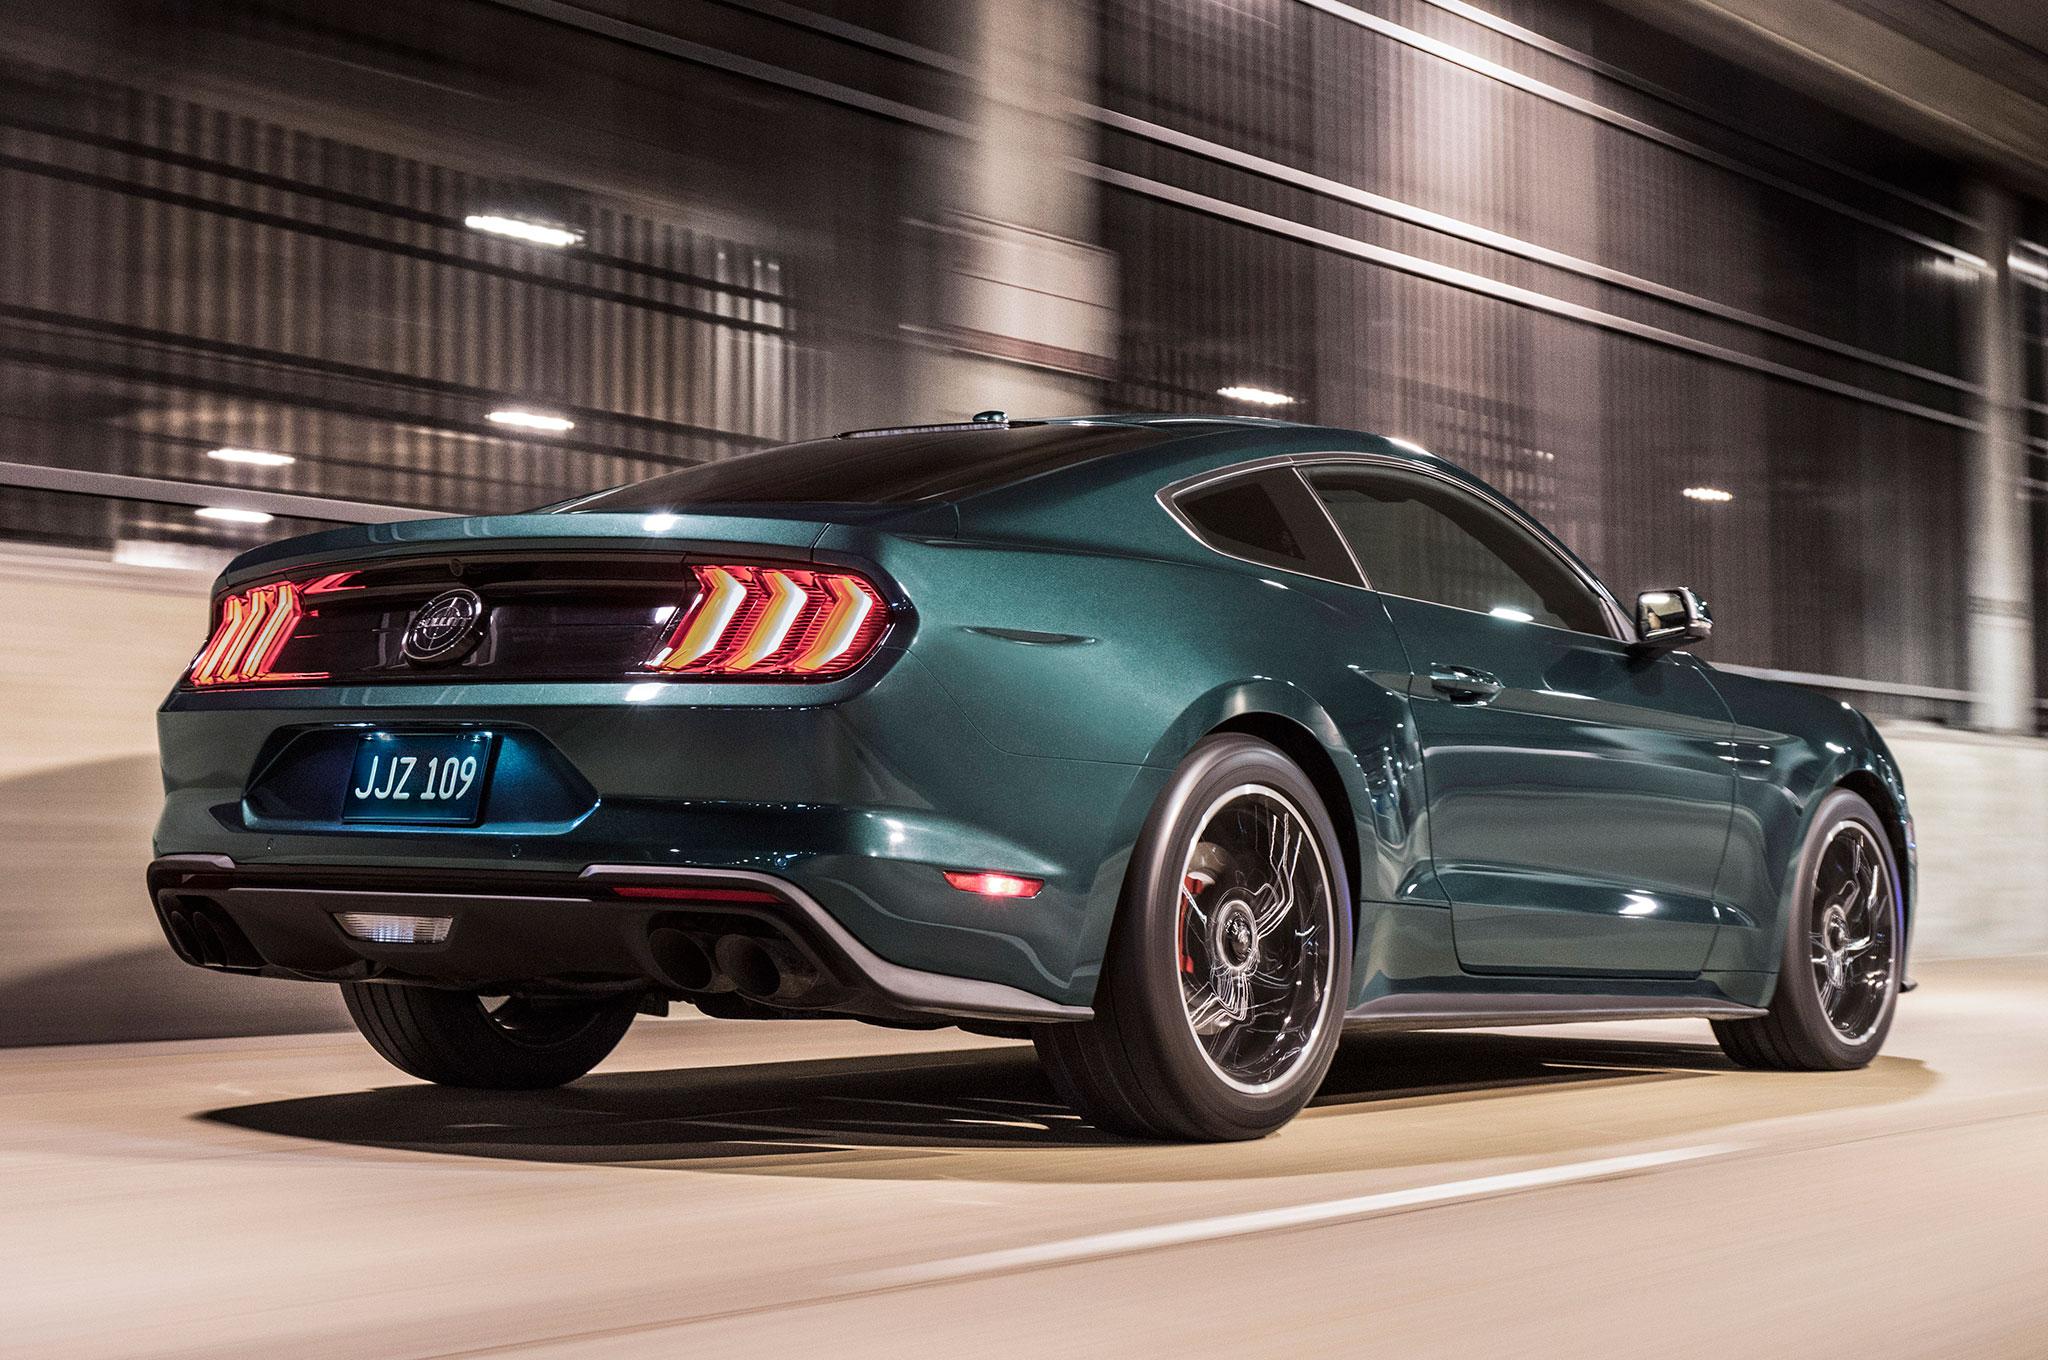 2019 Ford Mustang Bullitt Rear Side View In Motion